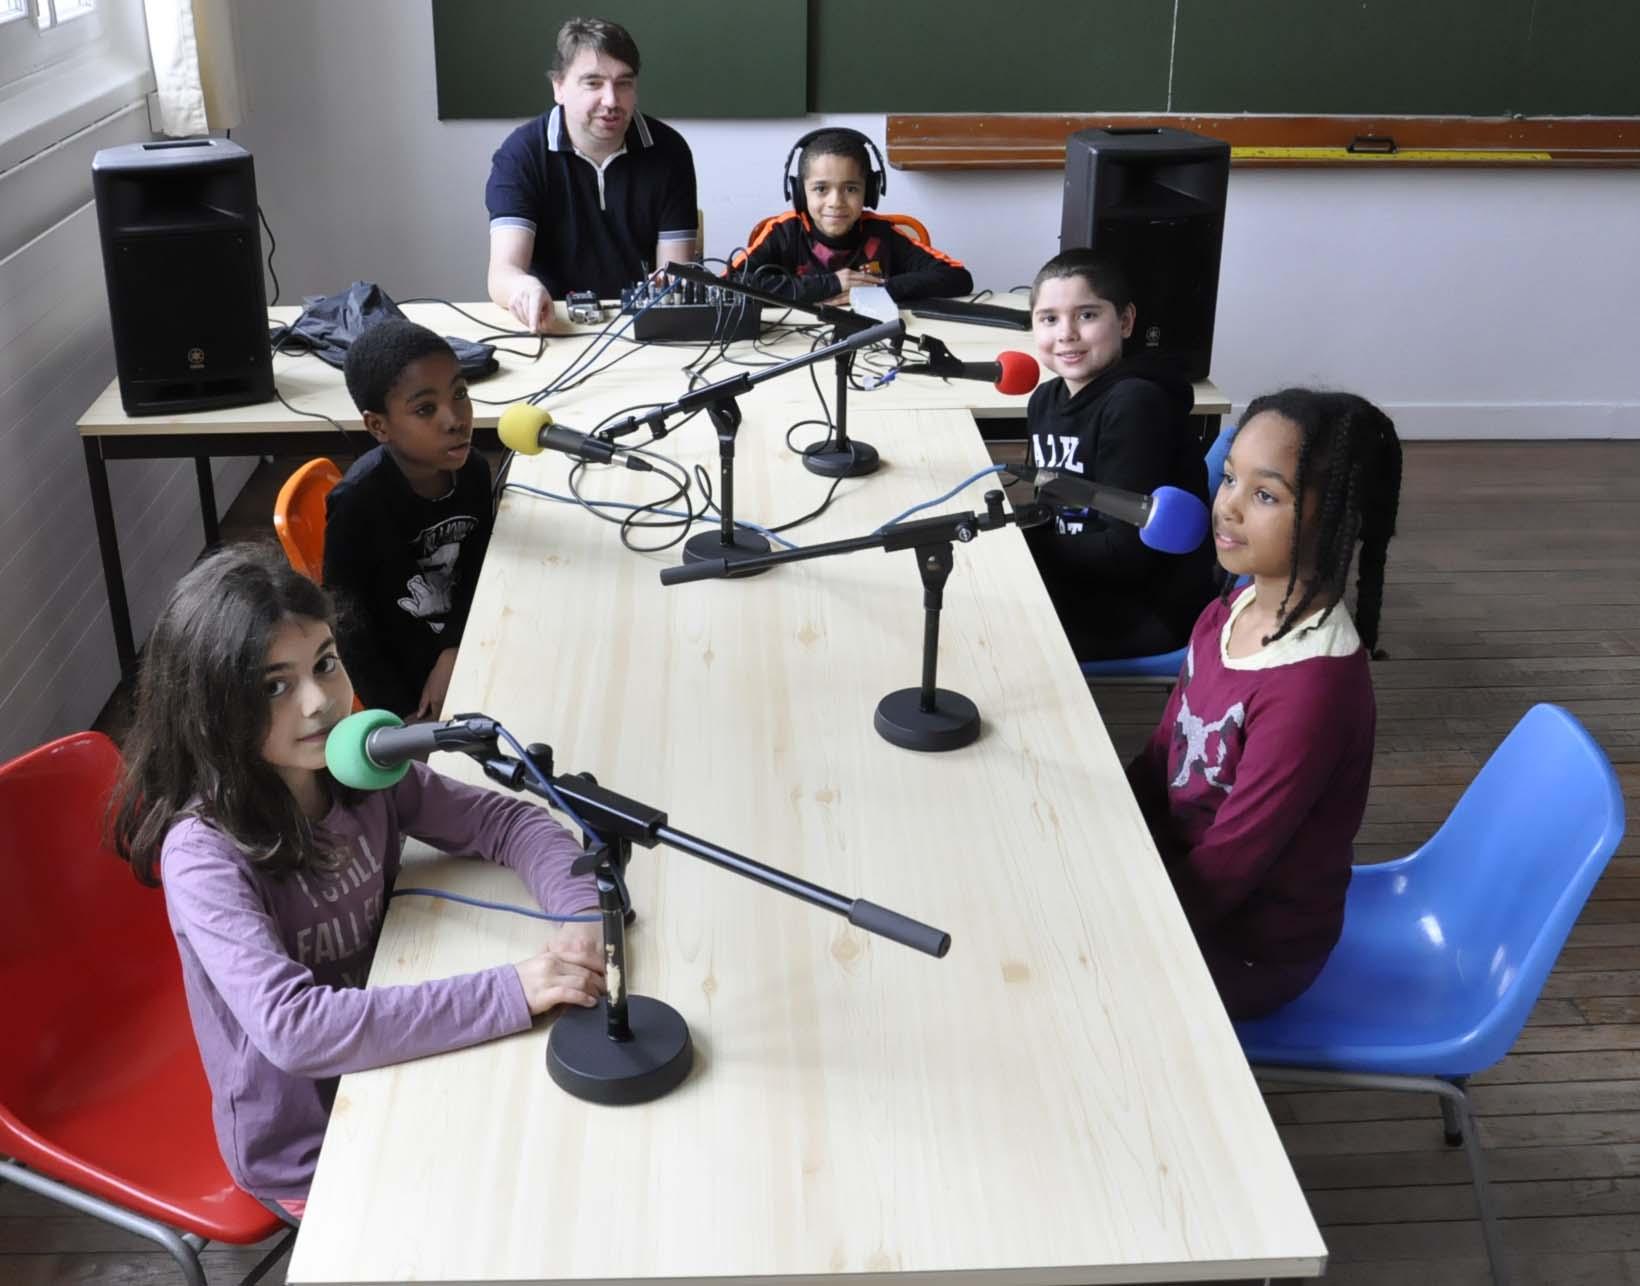 arnaud biree ateliersradio